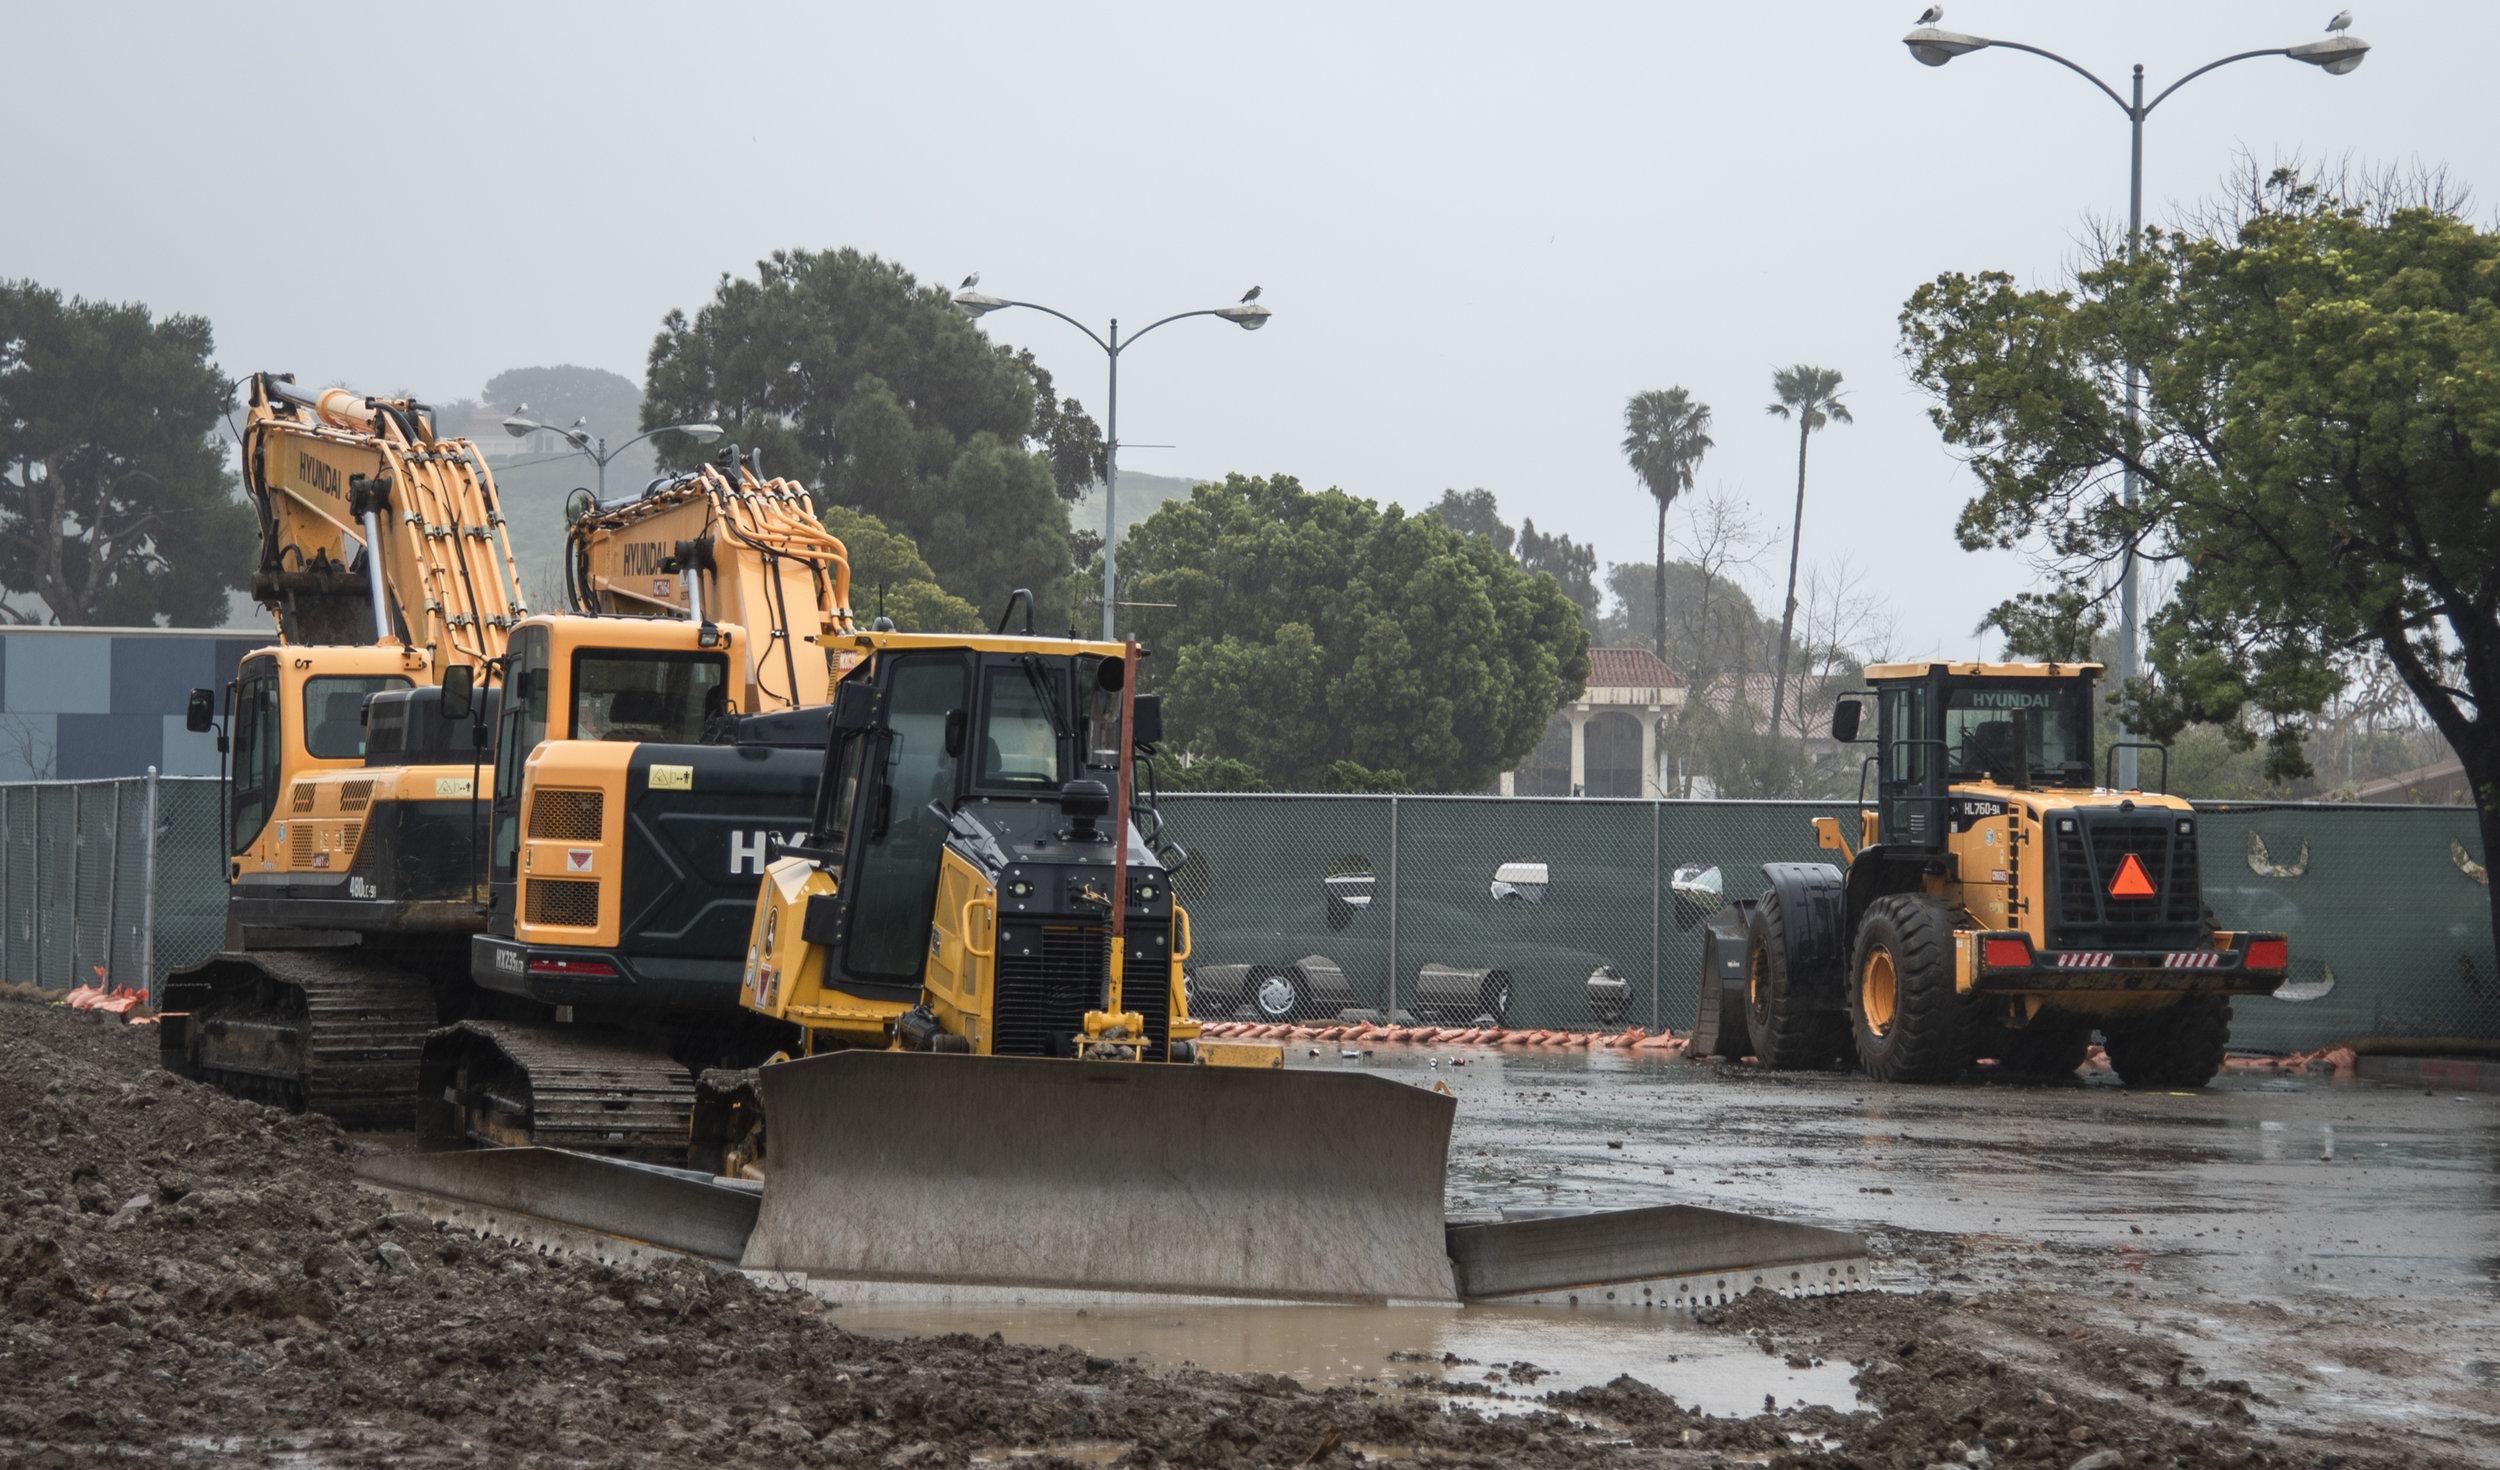 Construction on Santa Monica College's Malibu Campus halts due to continuous heavy rainfall on February 14, 2019 in Malibu, California. Photo By: Oskar Zinnemann/The Corsair